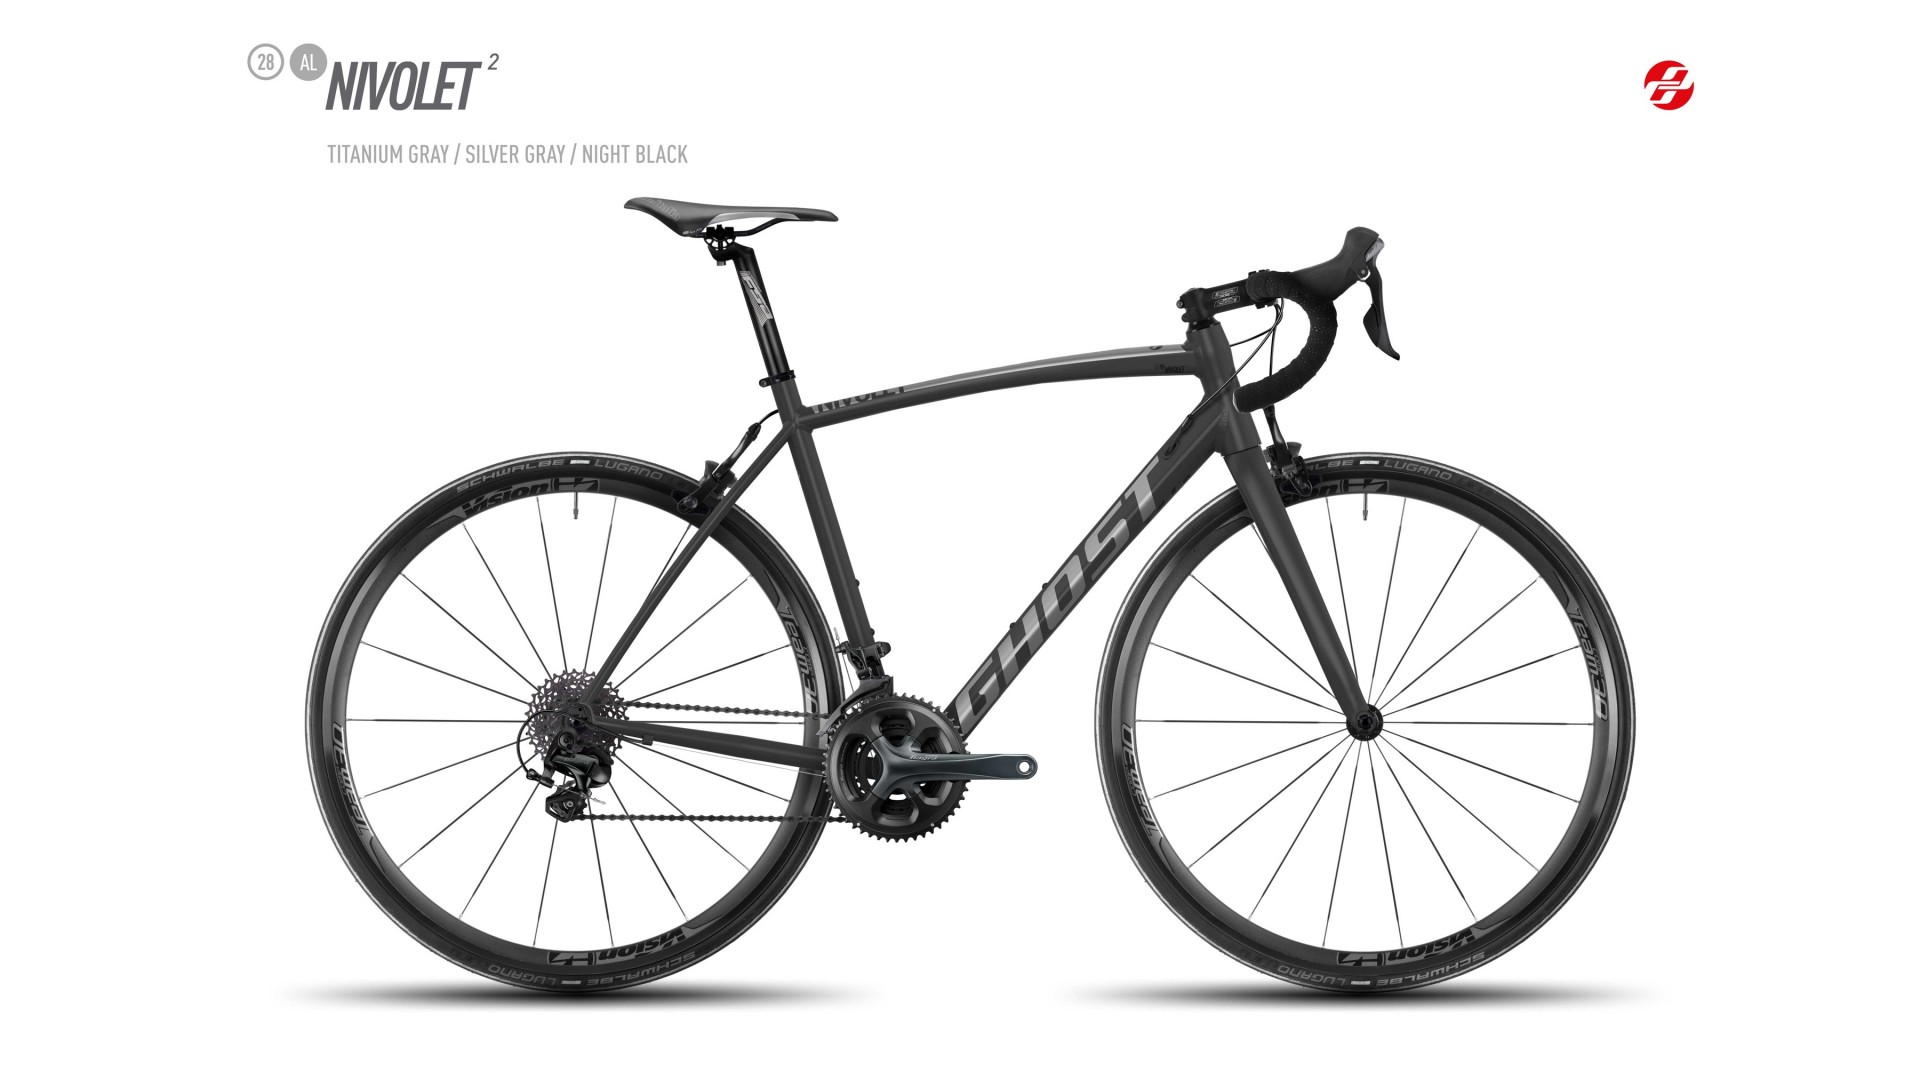 Велосипед GHOST Nivolet 2 AL 28 titaniumgrey/silvergrey/nightblack год 2017